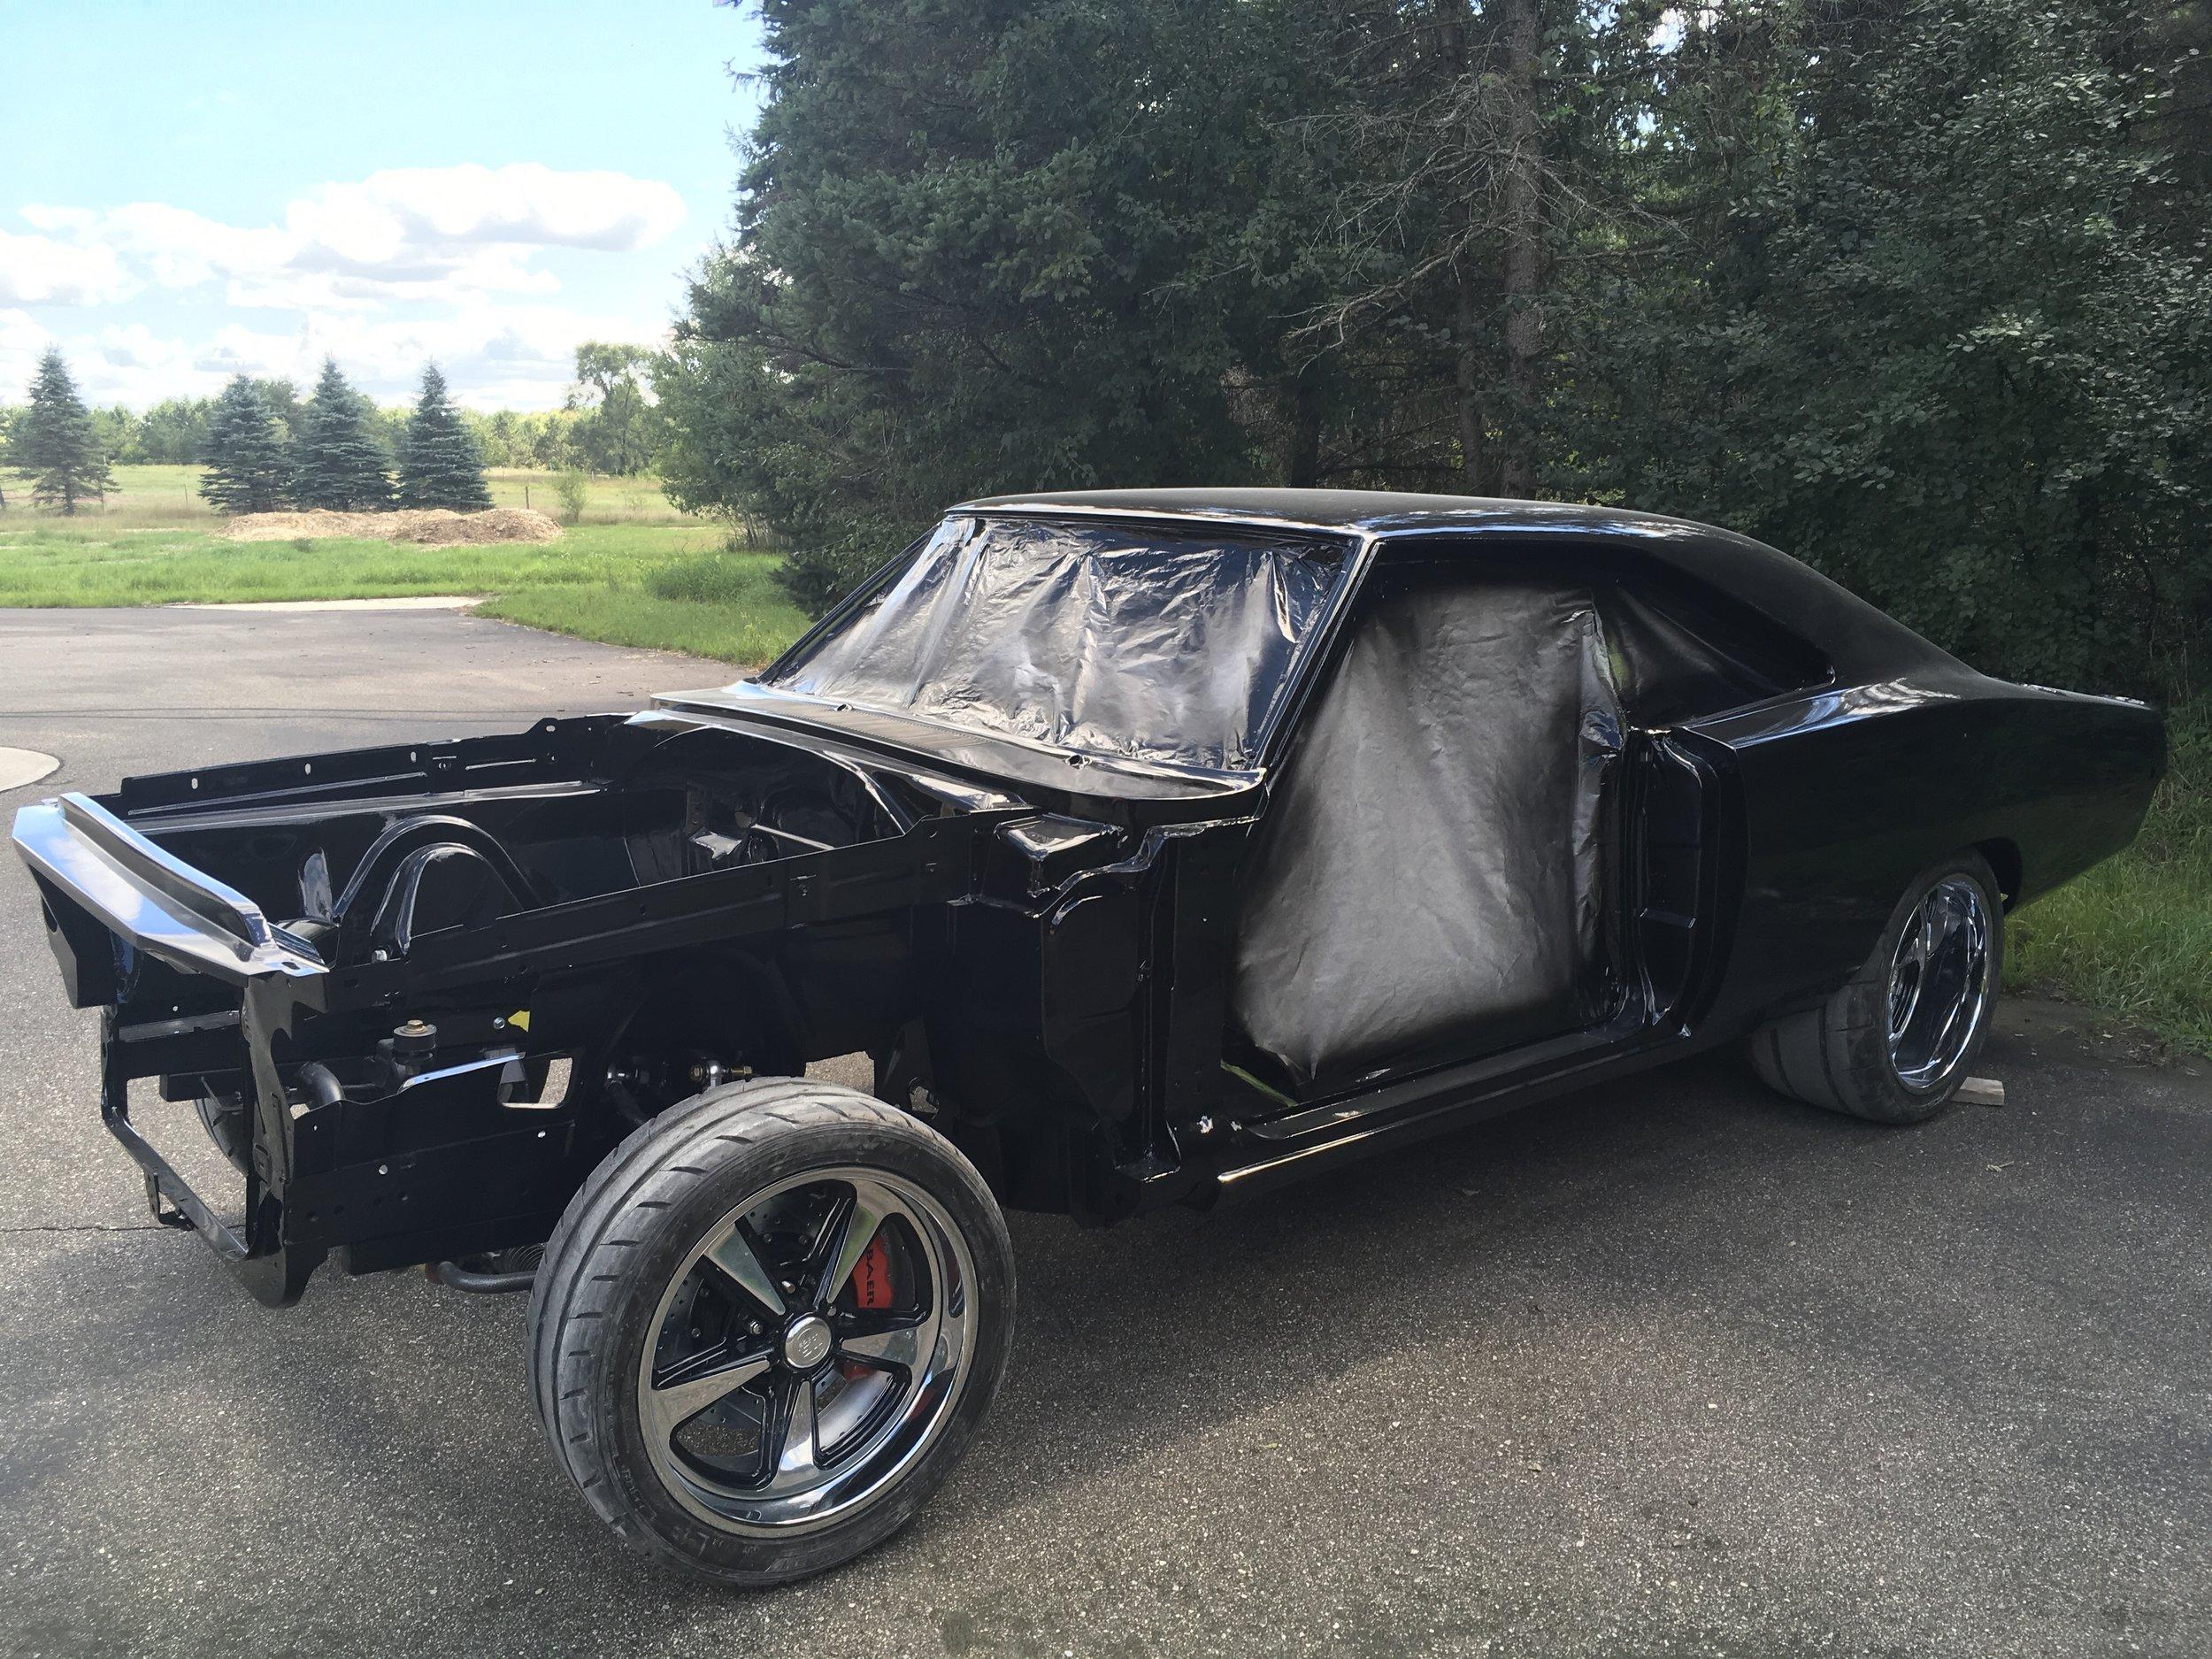 1968-Hell-Cat-Charger-minneapolis-hot-rod-custom-build-restoration-body-work.jpg